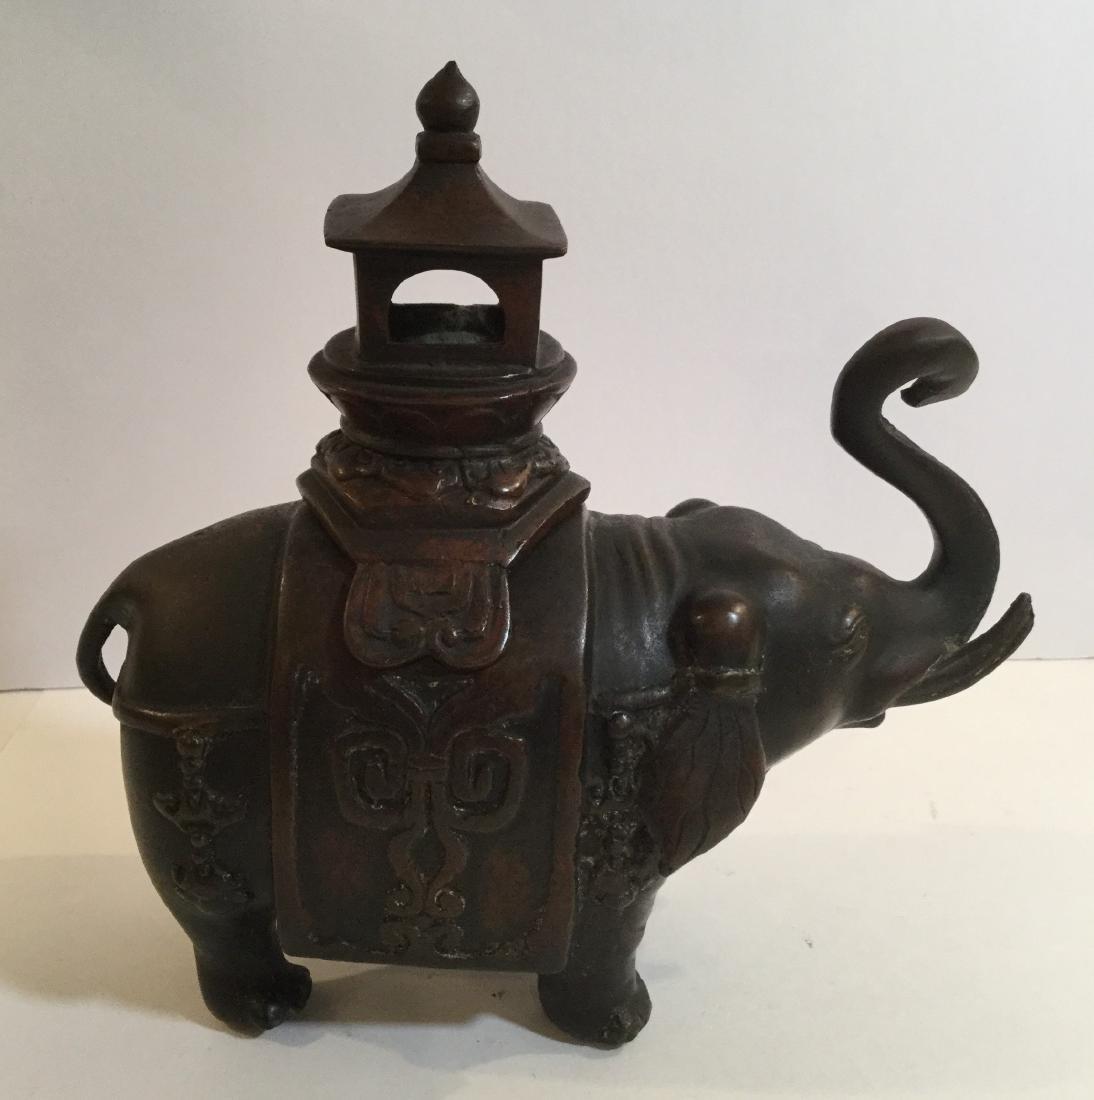 19th century Chinese Bronze Elephant Form Censer